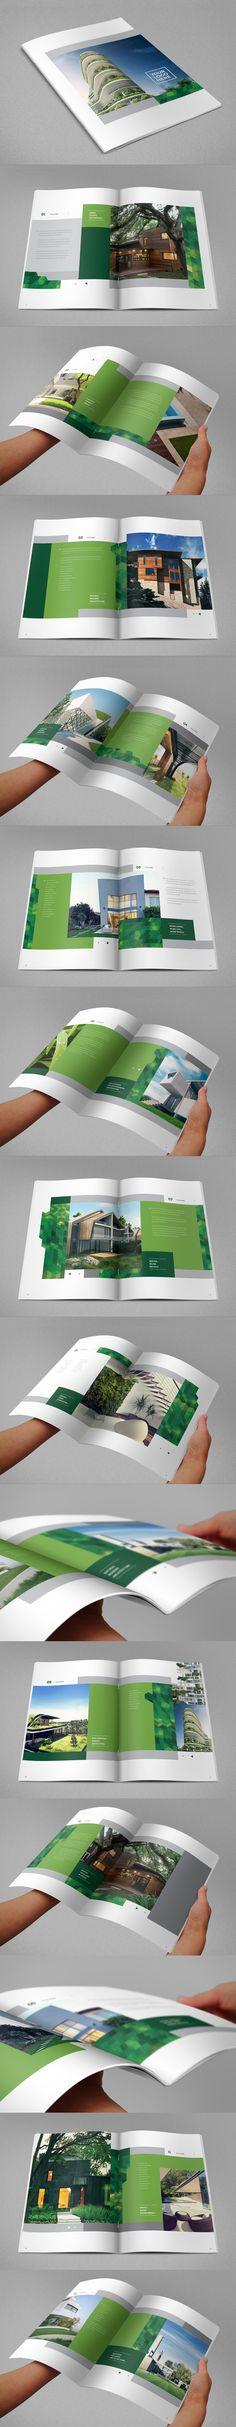 Ecologic Real Estate Brochure. Download here: http://graphicriver.net/item/ecologic-real-estate-brochure/8645126?ref=abradesign #design #brochure